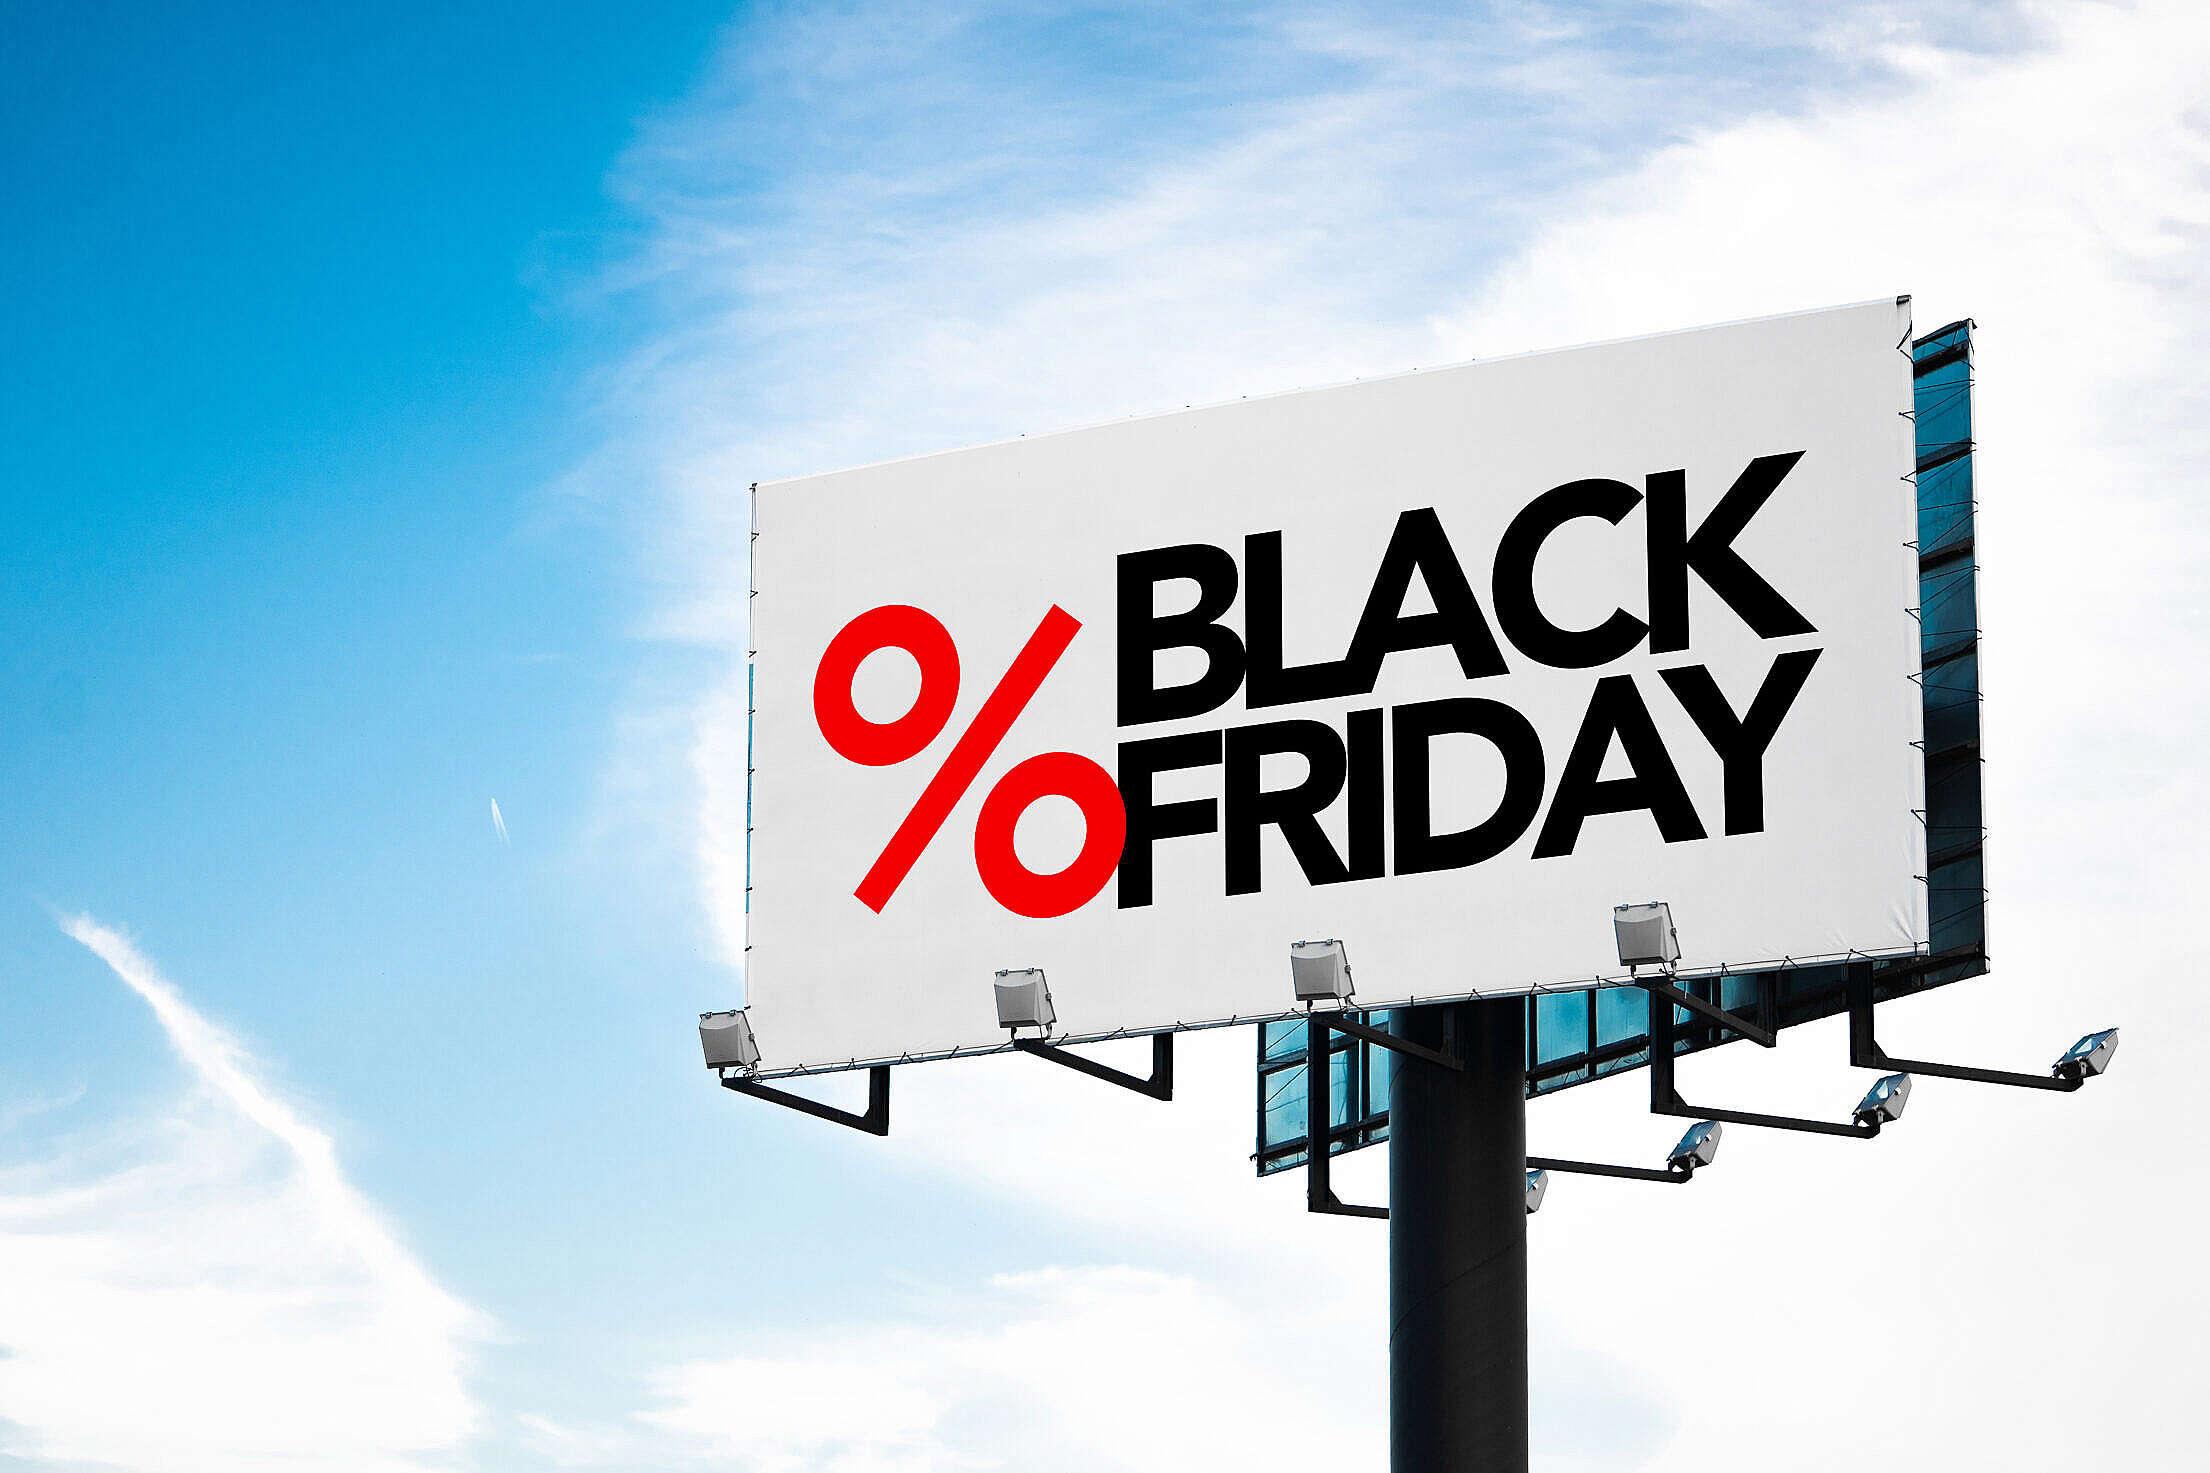 Black Friday Billboard Free Stock Photo